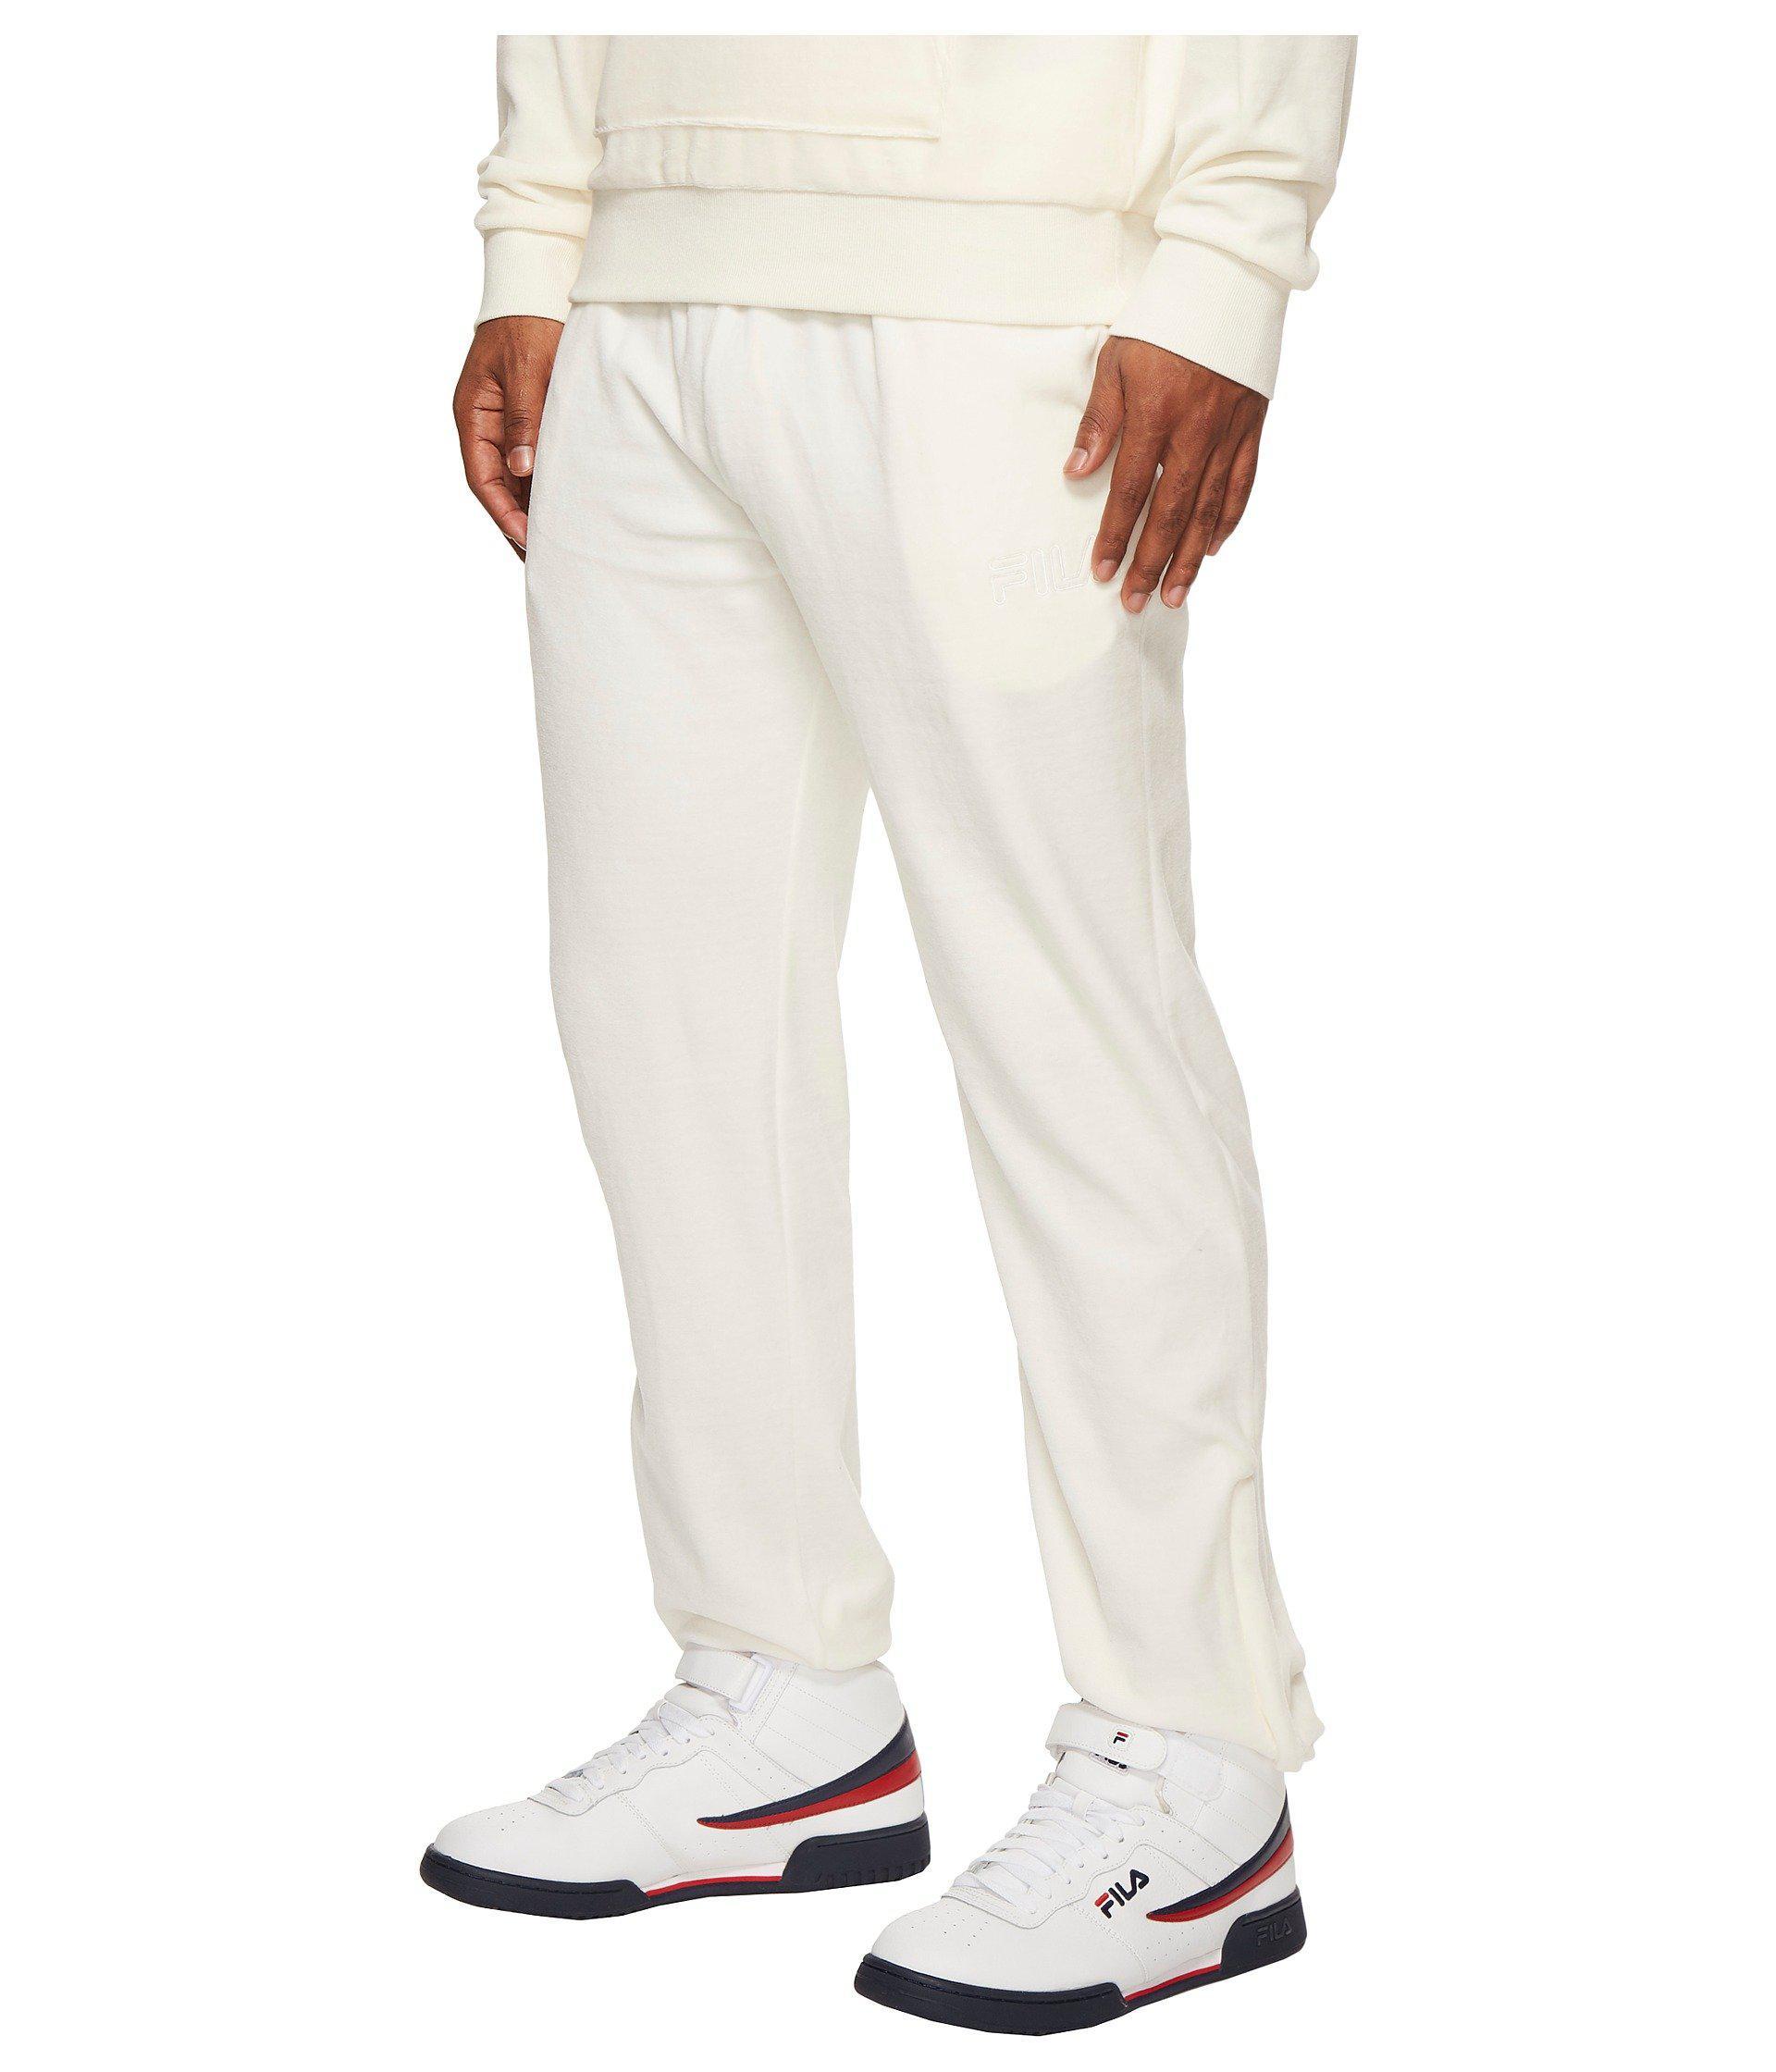 bcf2e39a4b79c Fila Yard Velour Pants for Men - Lyst